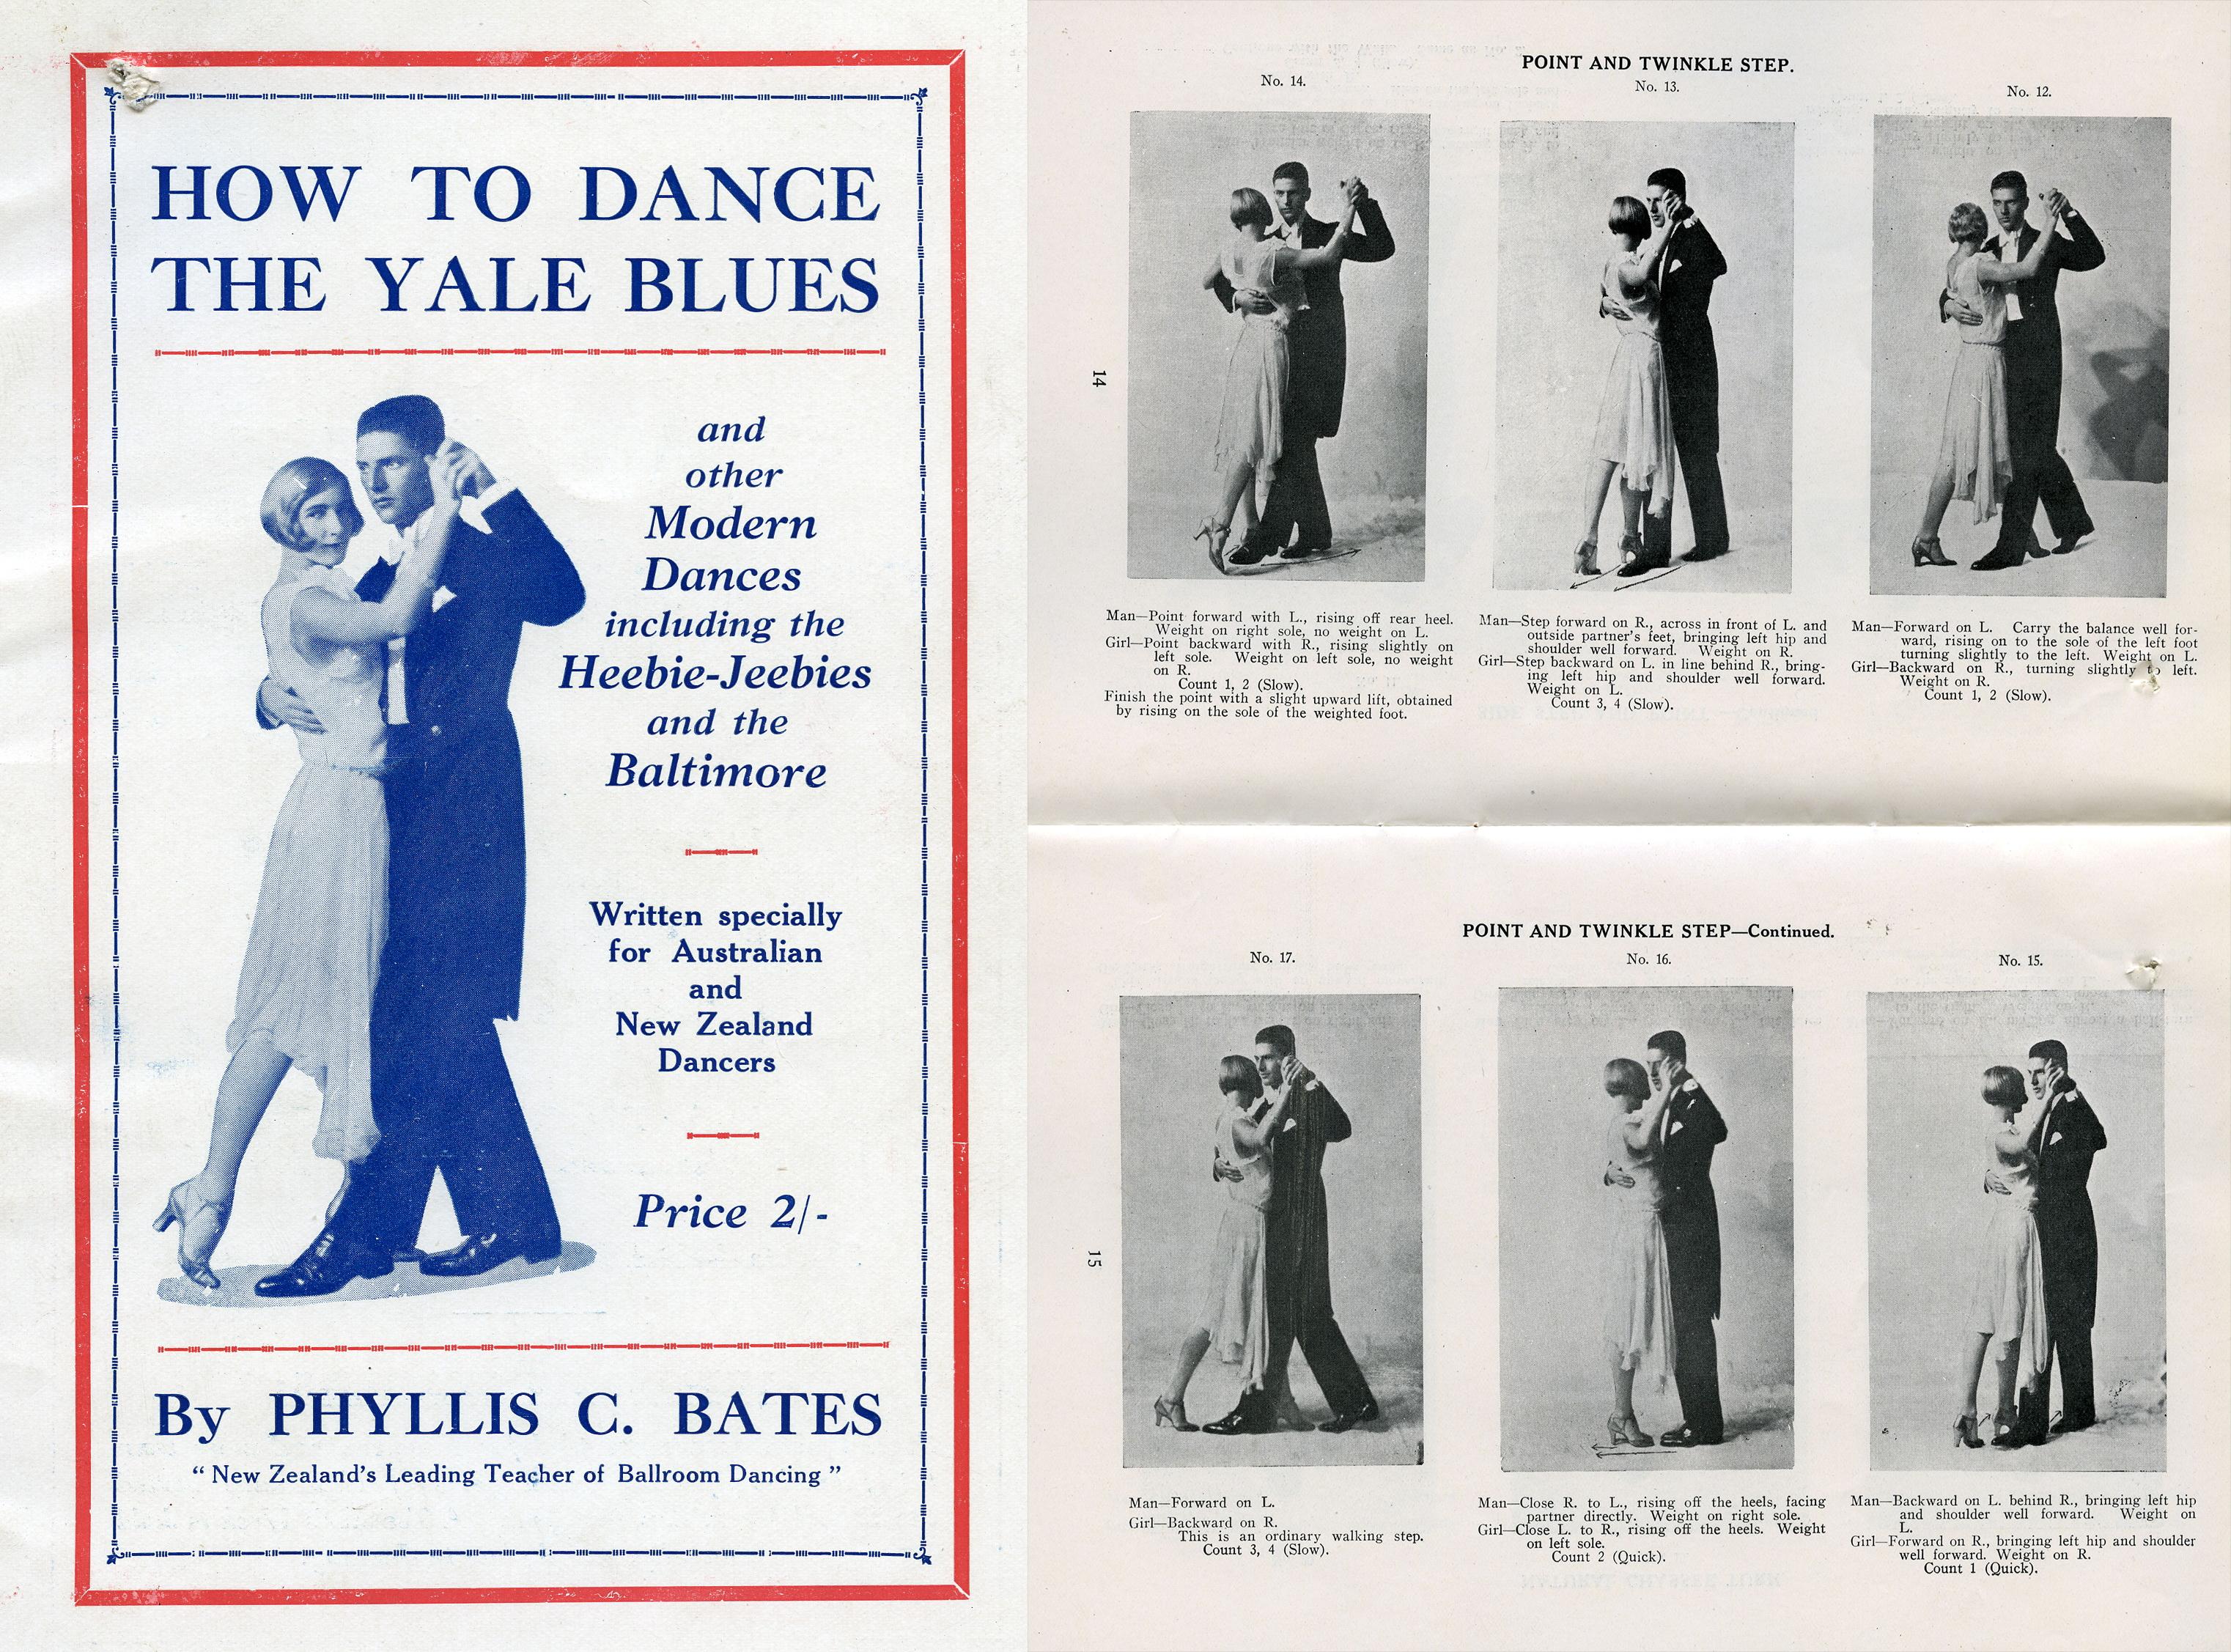 Fileballroom Dancing Instructions1928 15573494586g